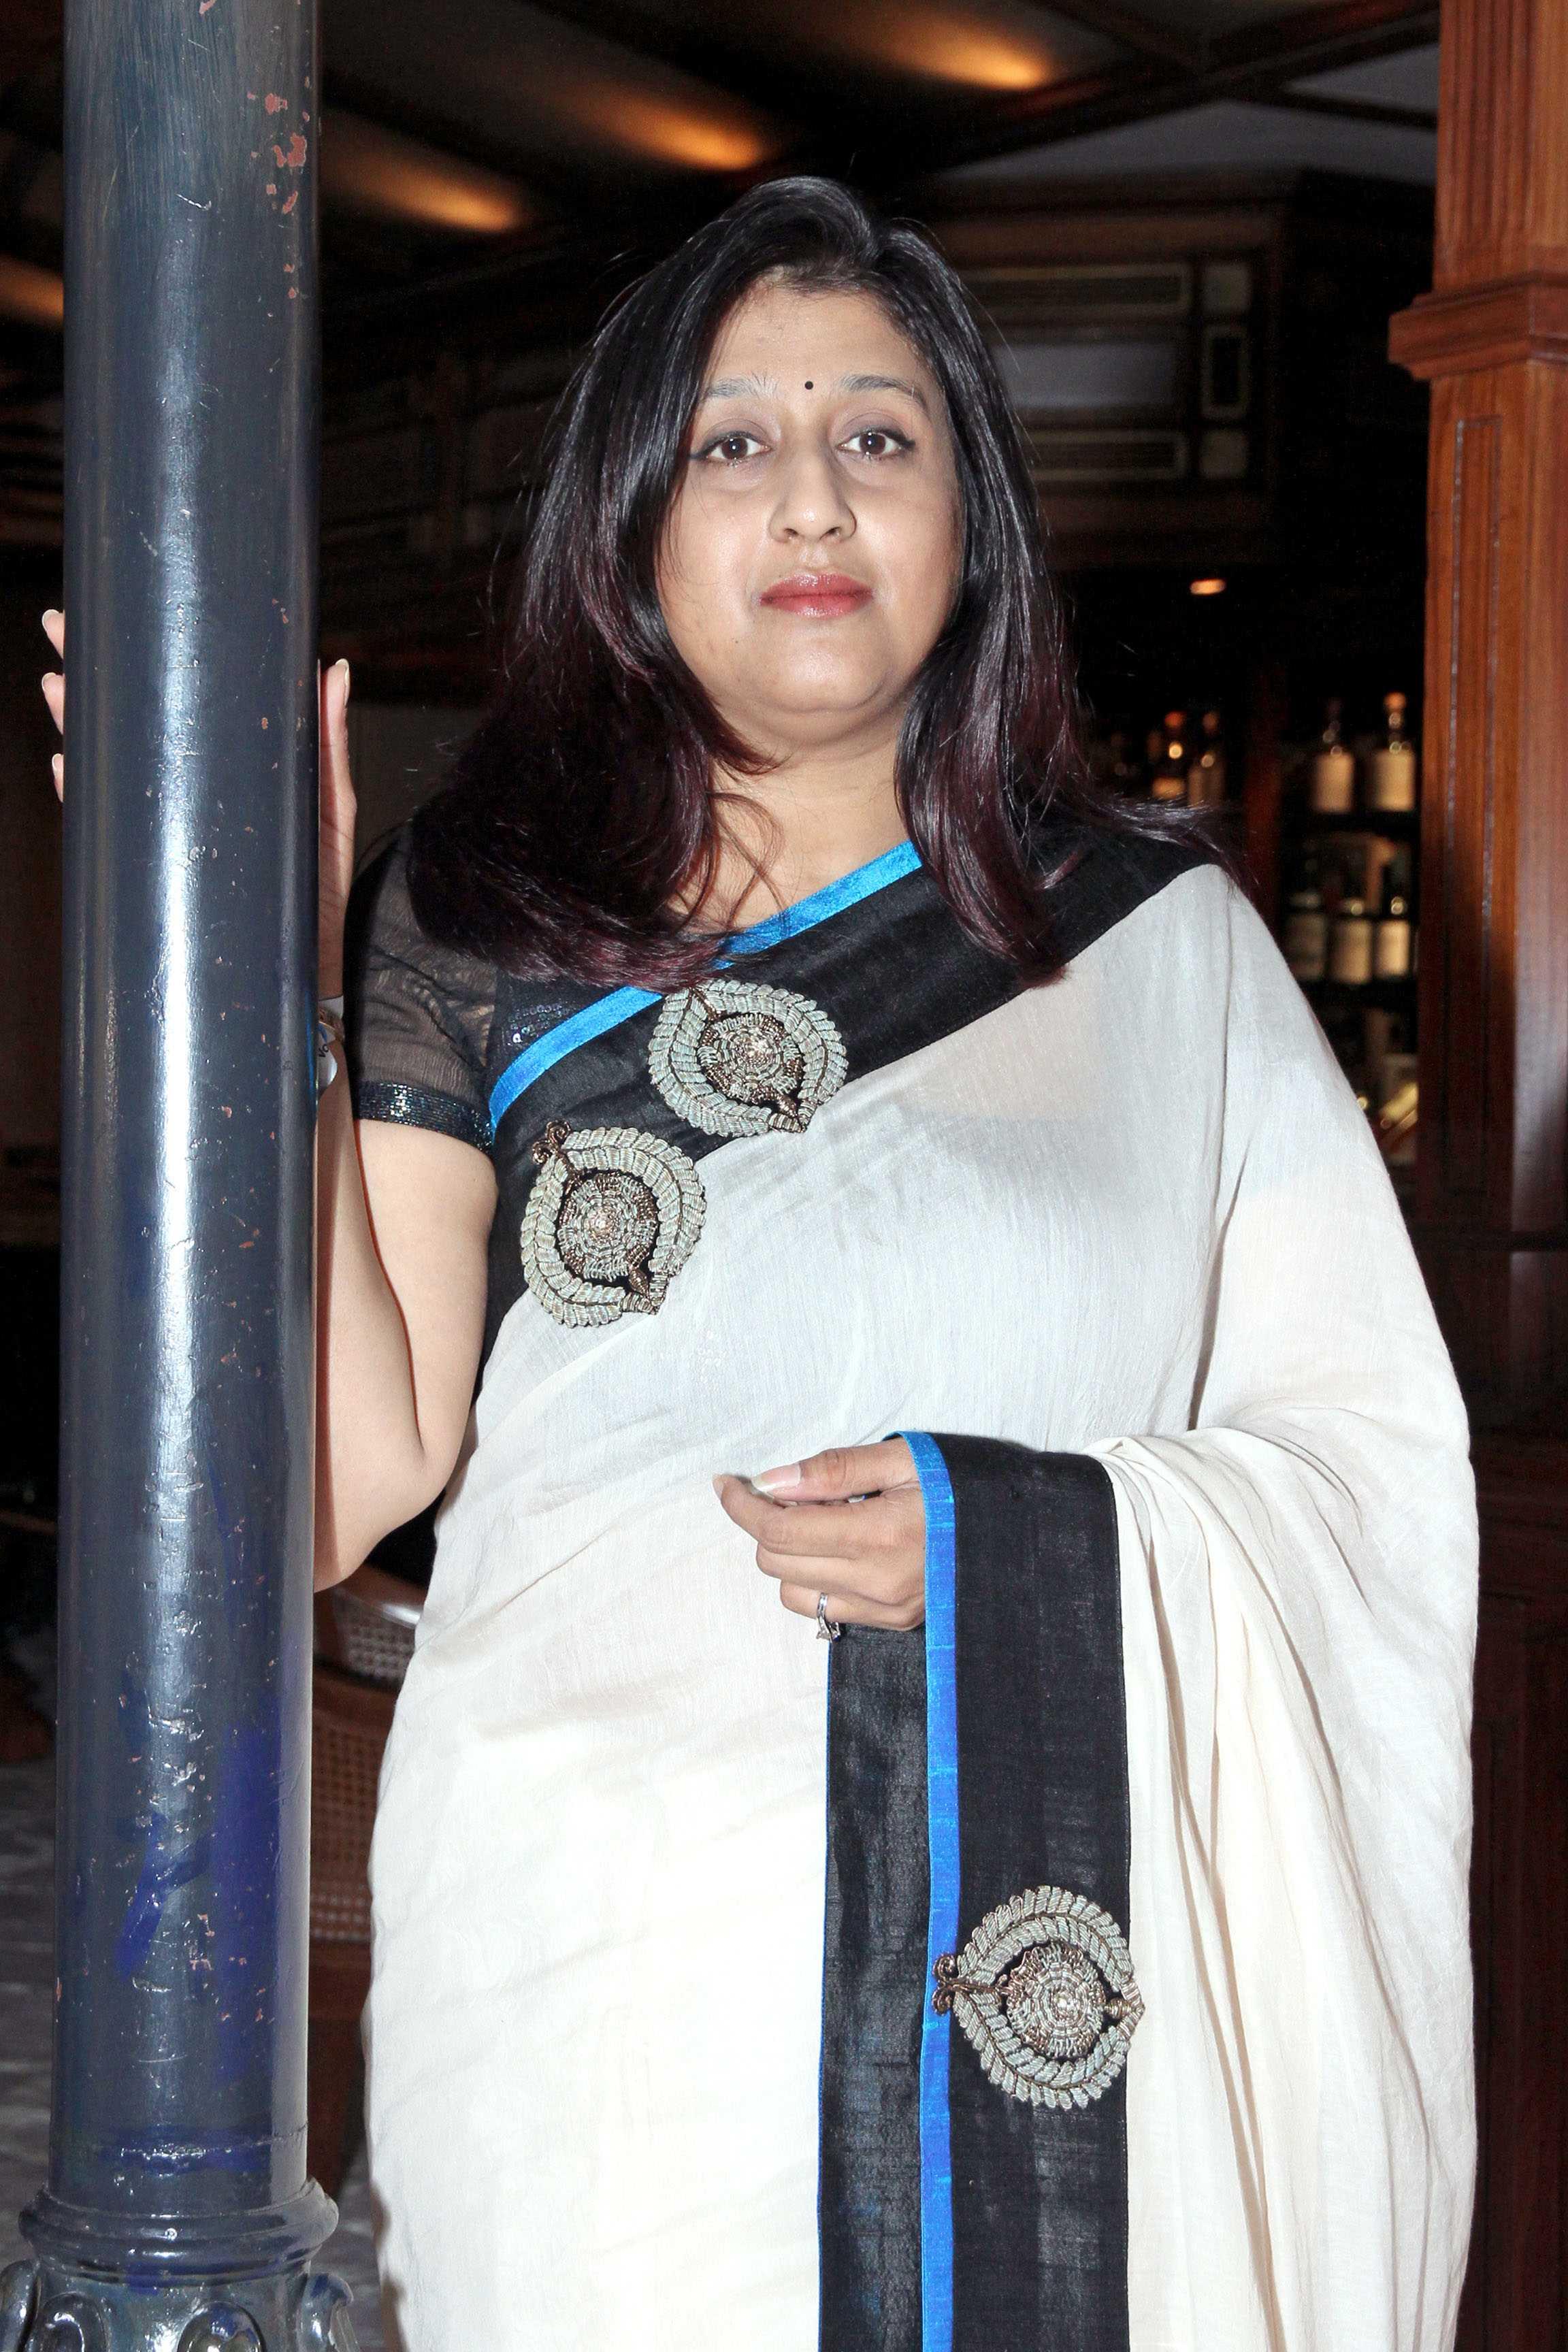 Priya Tanna, Editor of Vogue India at the Vogue Wedding Show